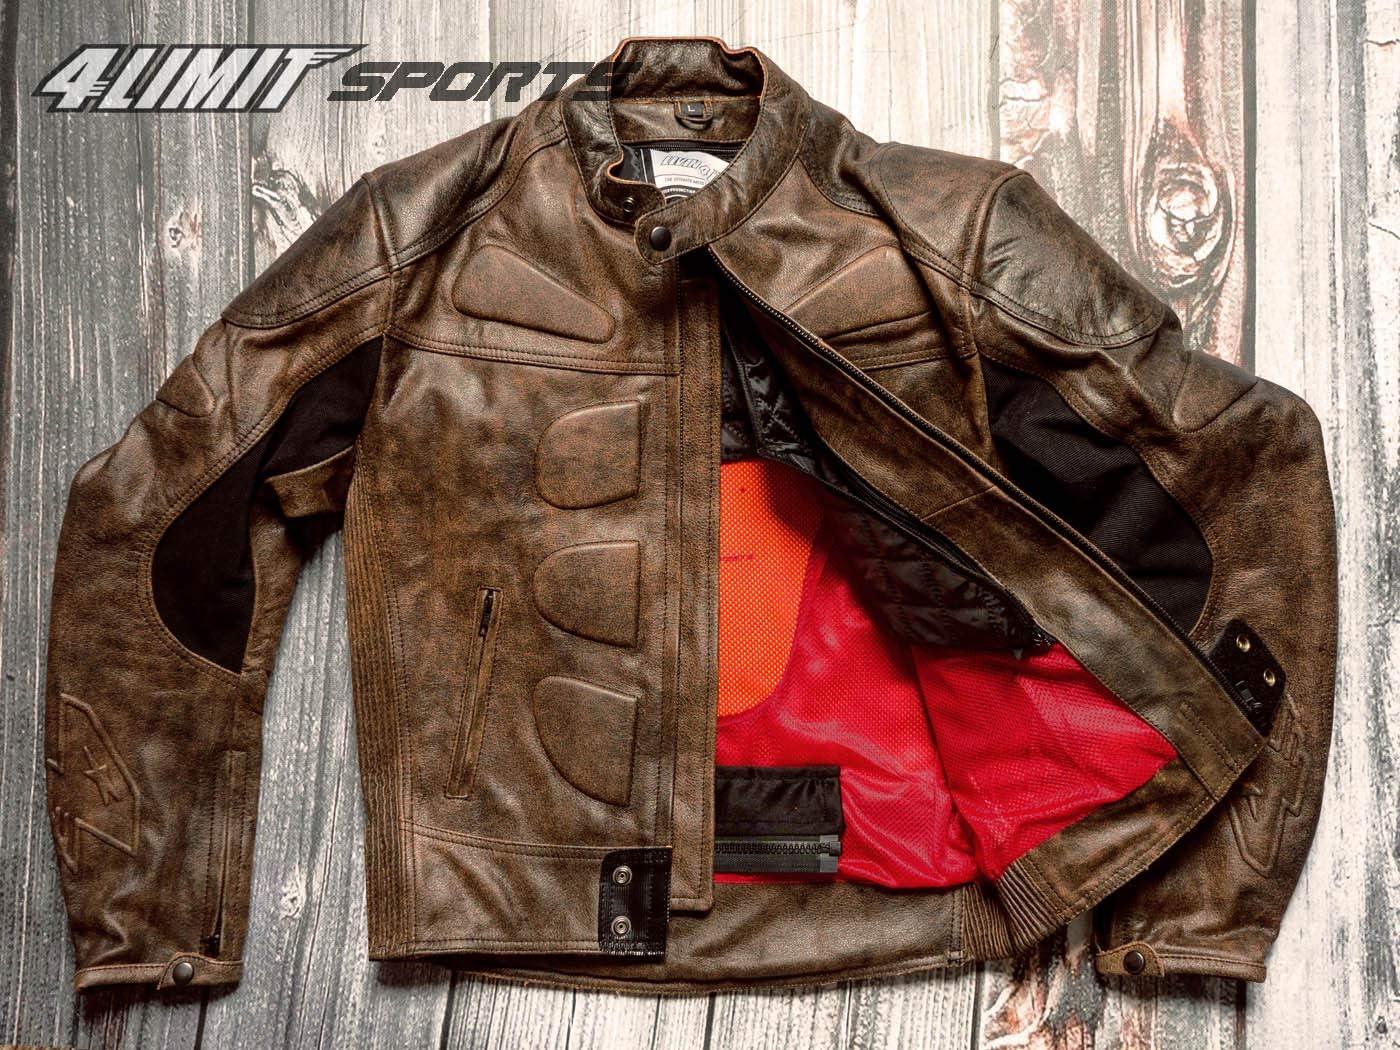 4limit Sports Motorradjacke Leder Streetbandit Biker Rocker Schwarz Größe M Auto